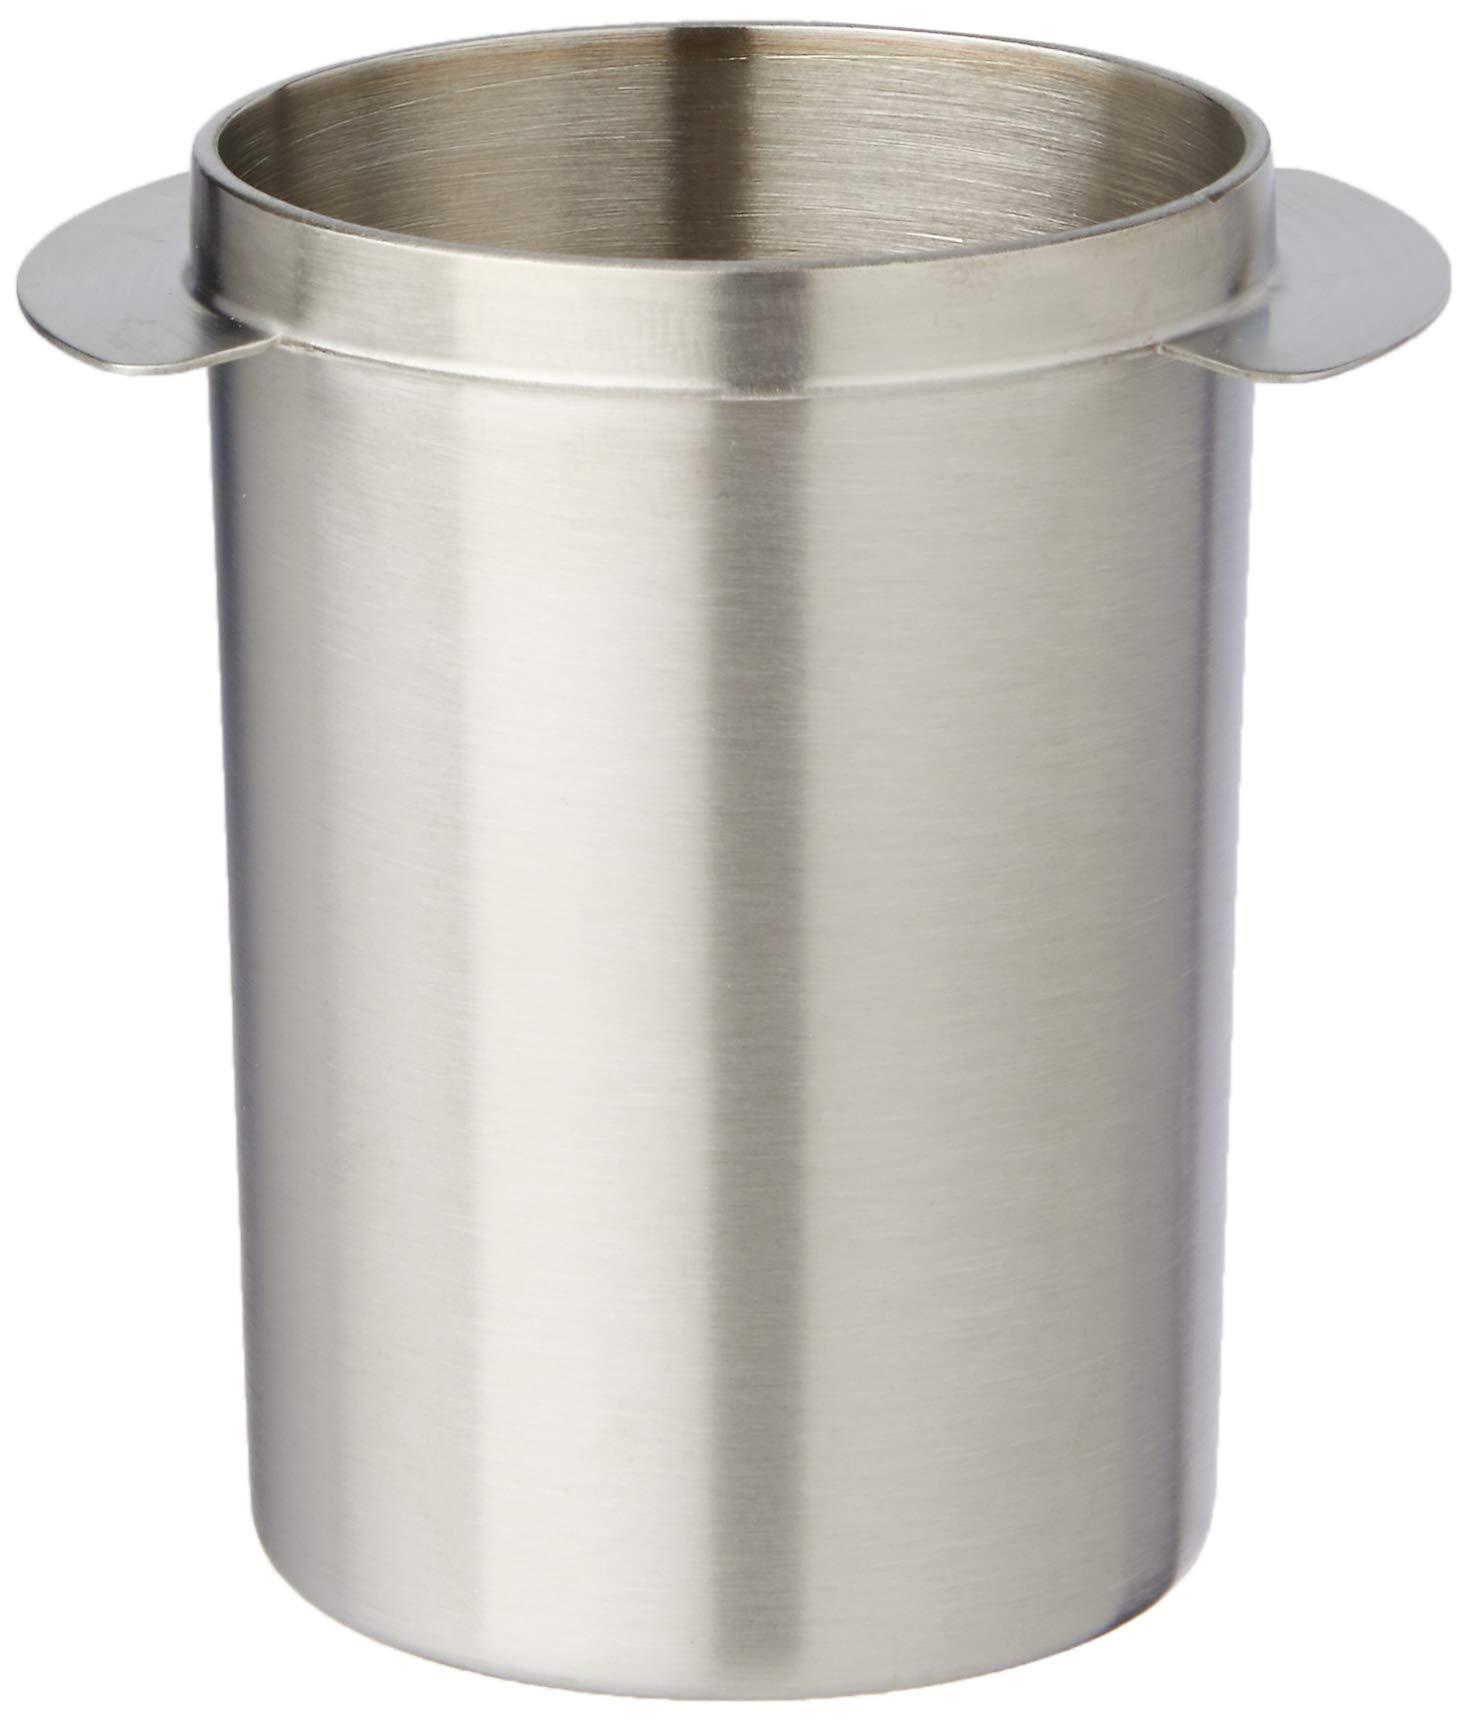 Rhino Coffee Gear RHDOSECUP Rhino Dosing Cup, Stainles Steel